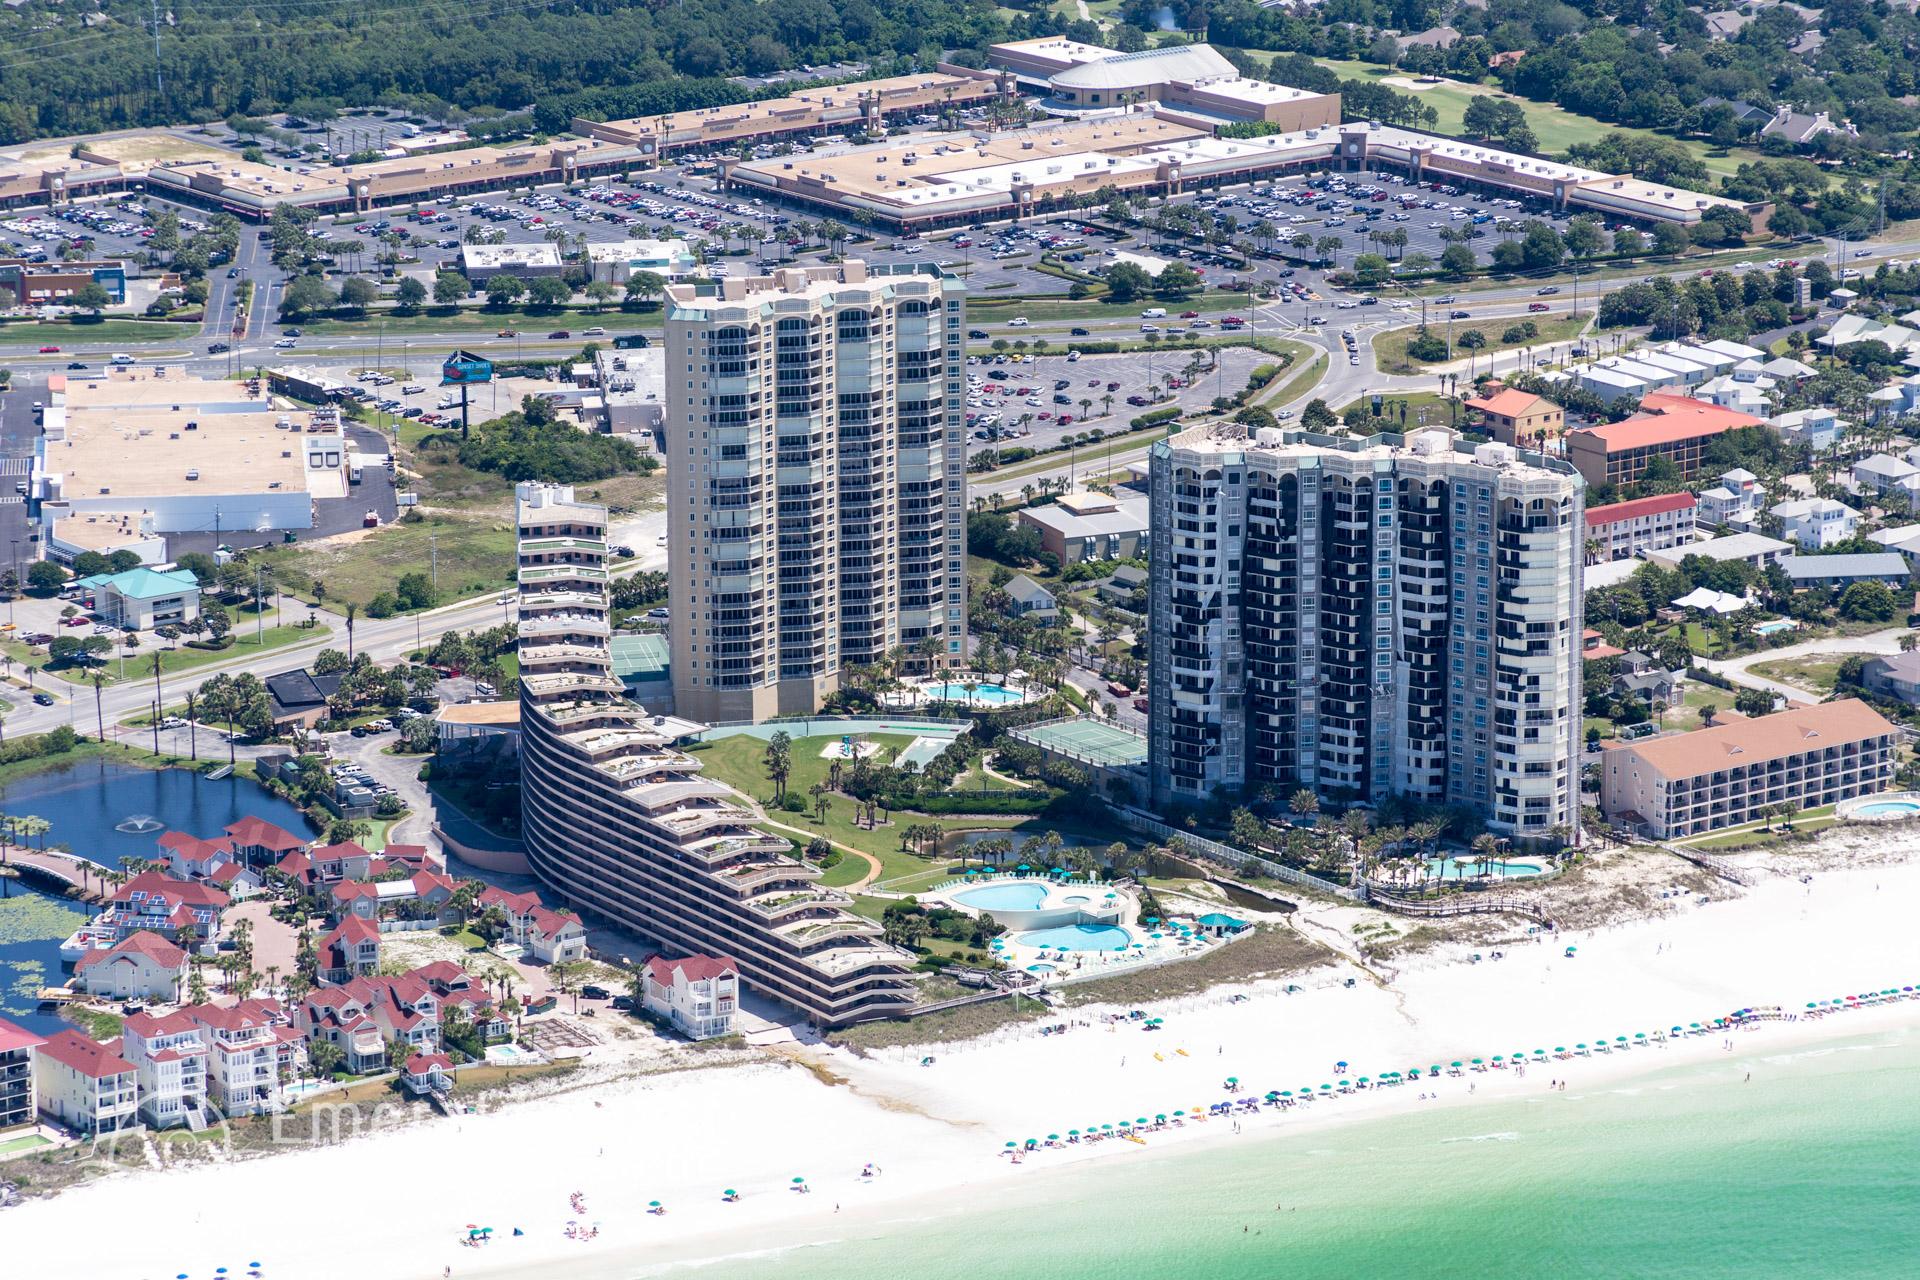 aerial view of the Sandestin Beach Resort